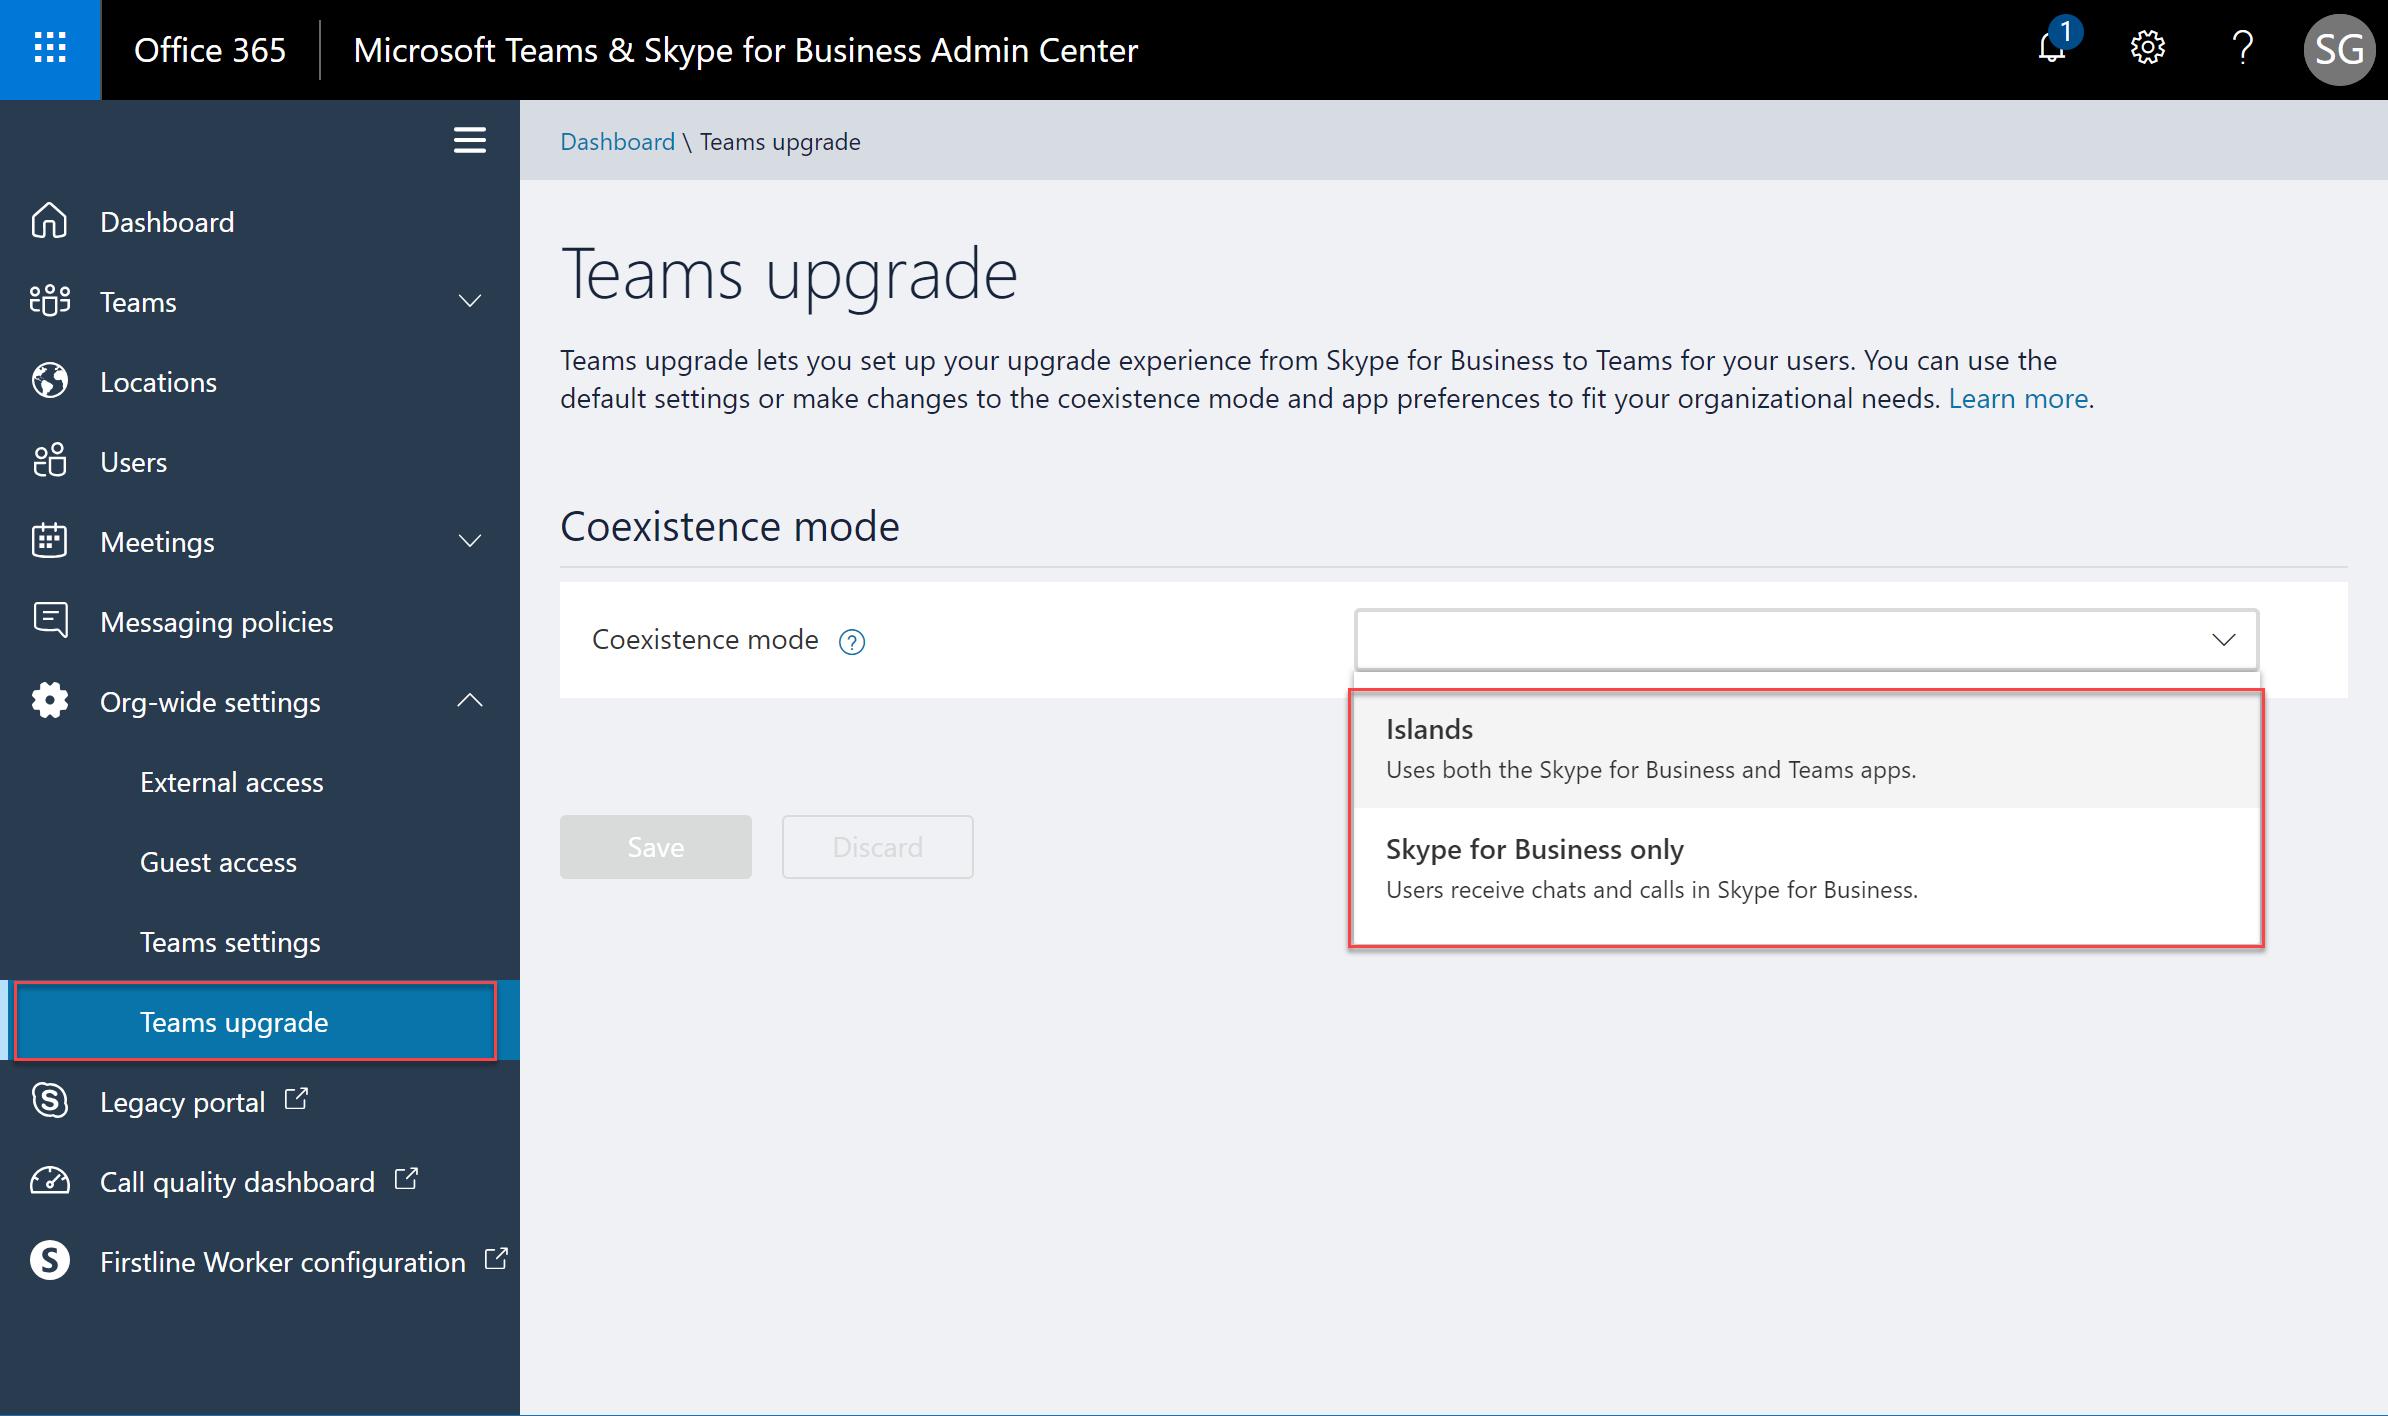 Microsoft Teams & Skype for Business Admin Center